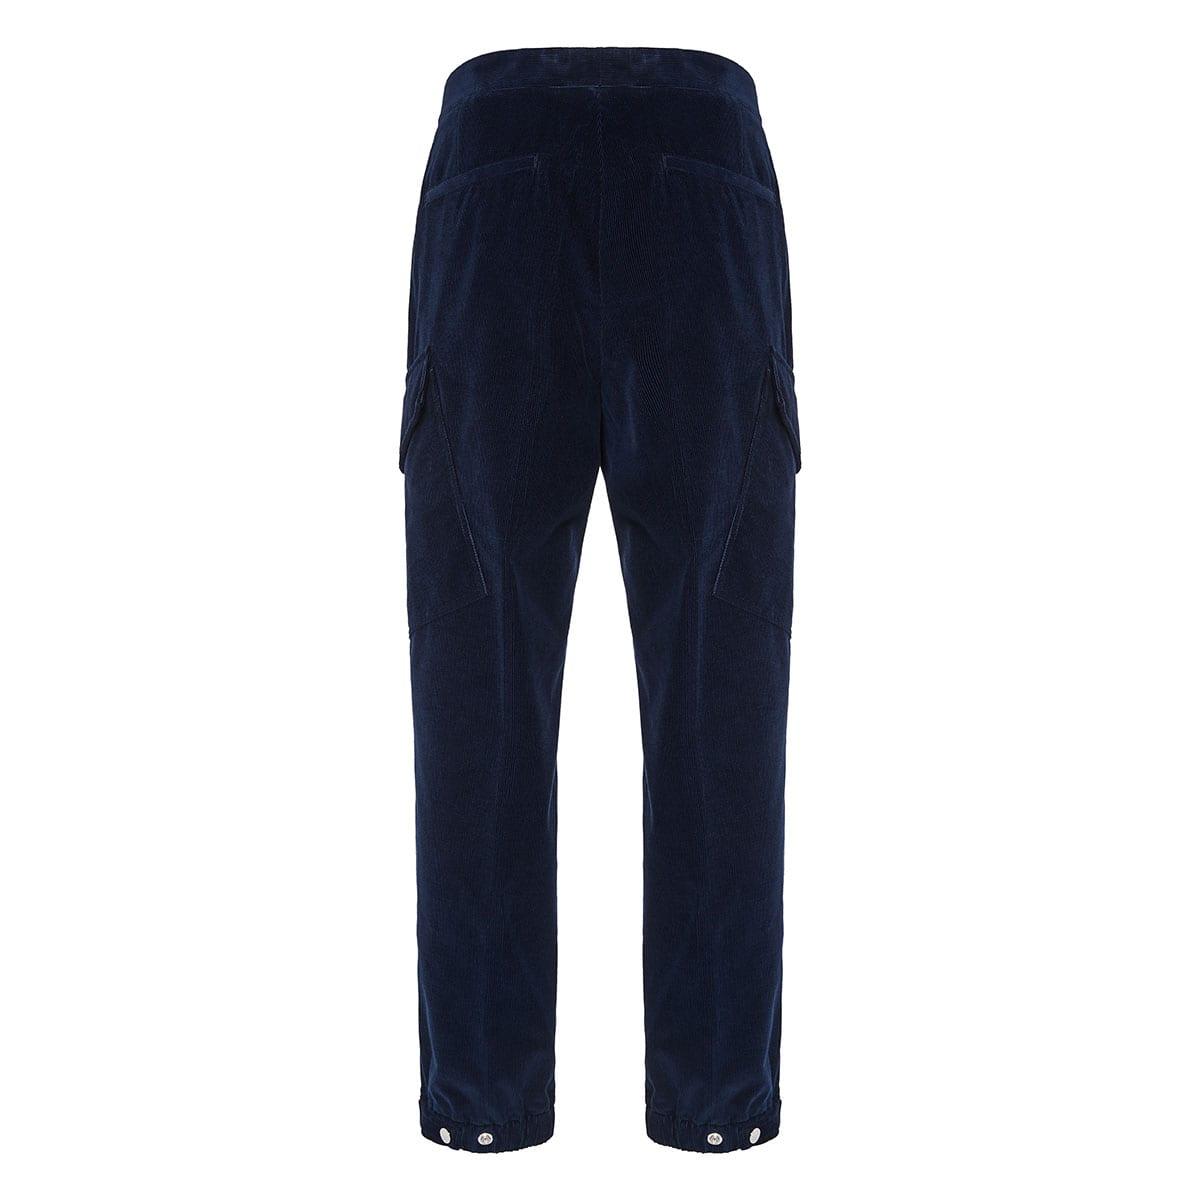 2 Moncler 1952+Valextra corduroy trousers